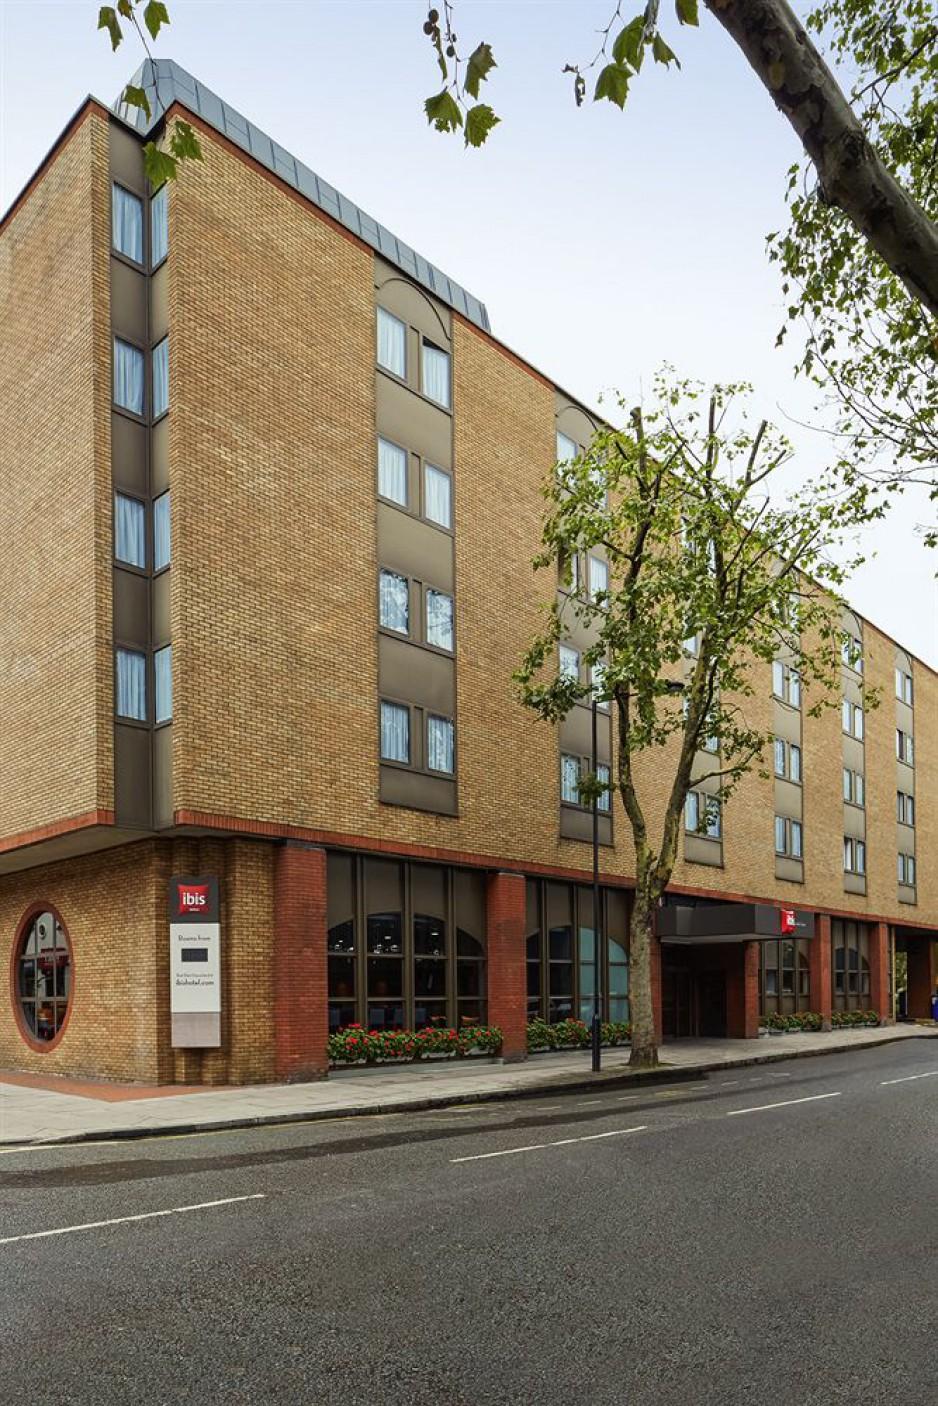 Ibis Hotel London St Pancras